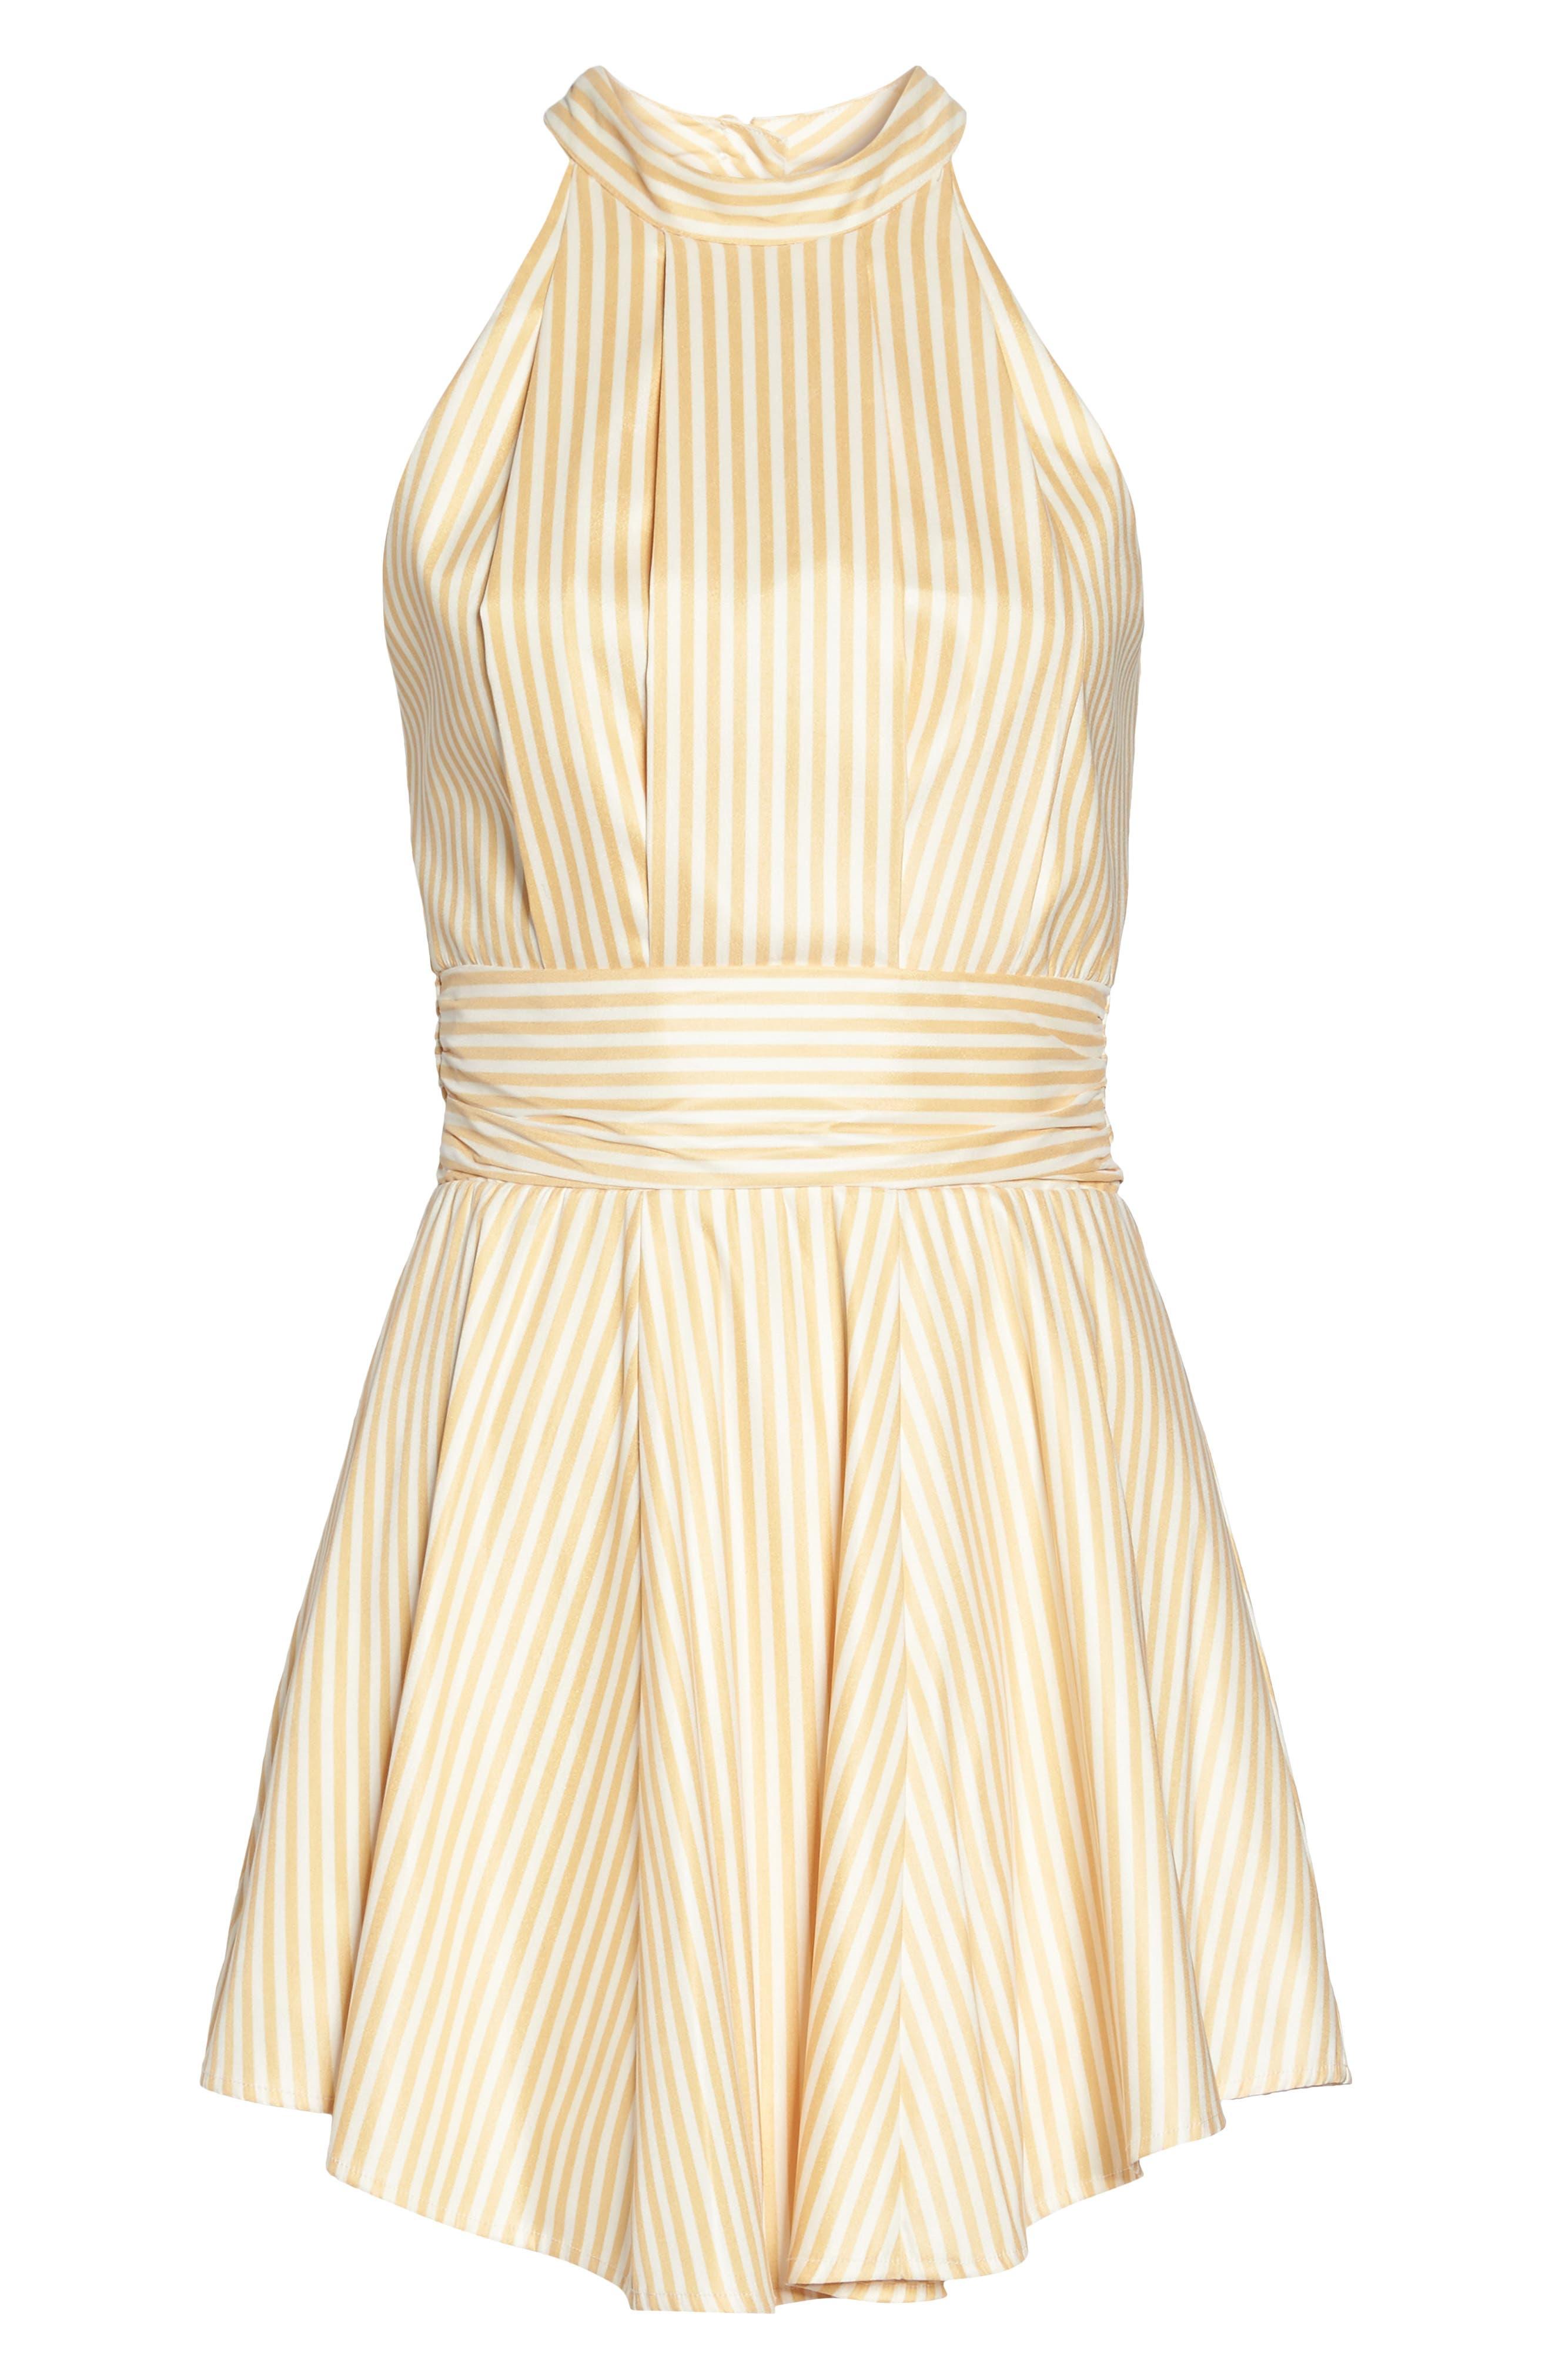 Believe in Me Halter Neck Party Dress,                             Alternate thumbnail 7, color,                             Honey Stripe